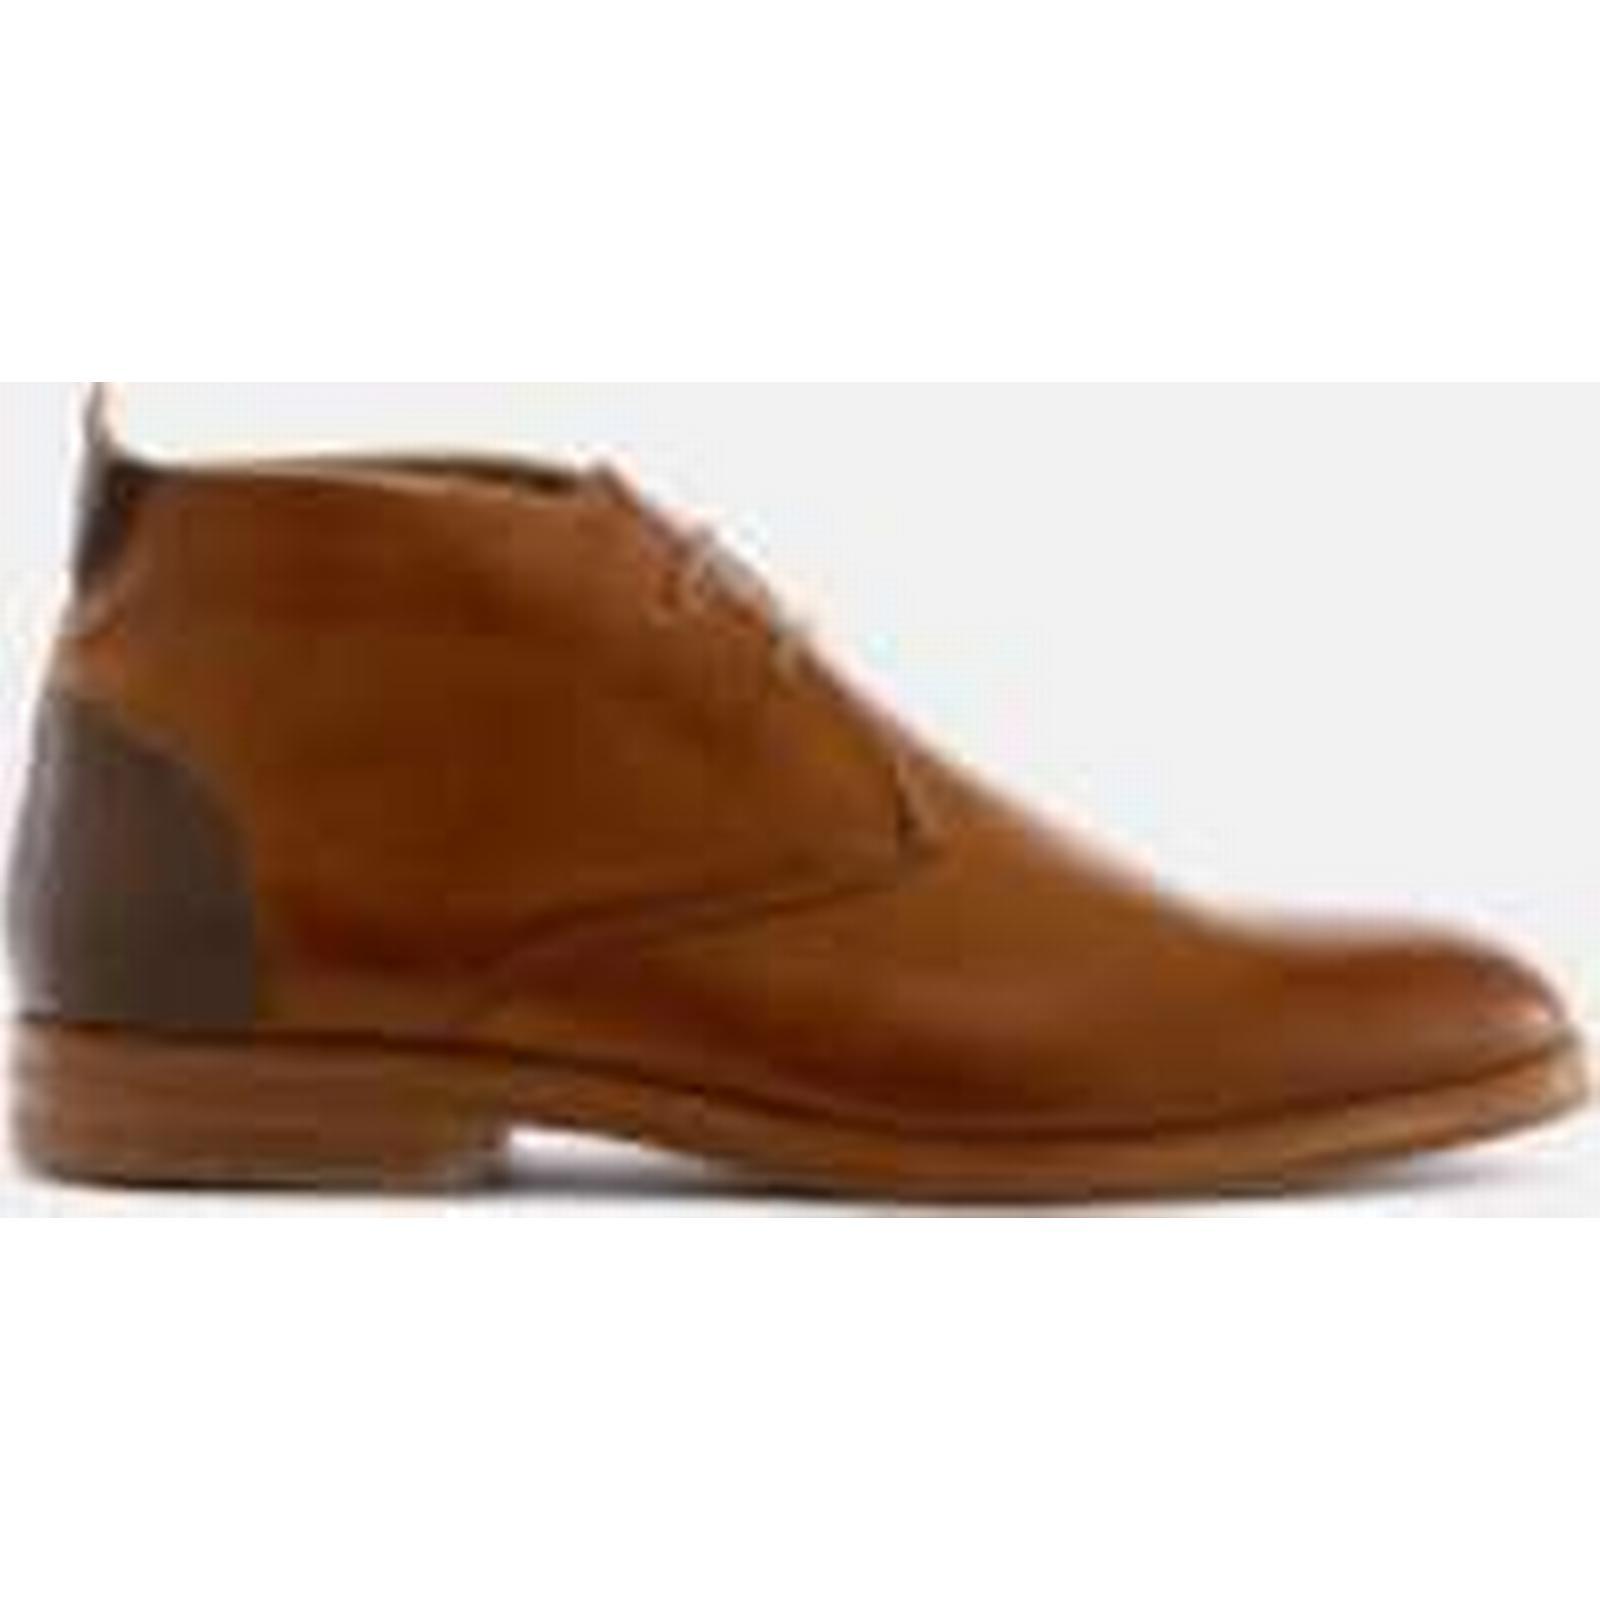 Hudson - London Men's Matteo Leather Desert Boots - Tan - Hudson UK 11 - Tan 4eff3c